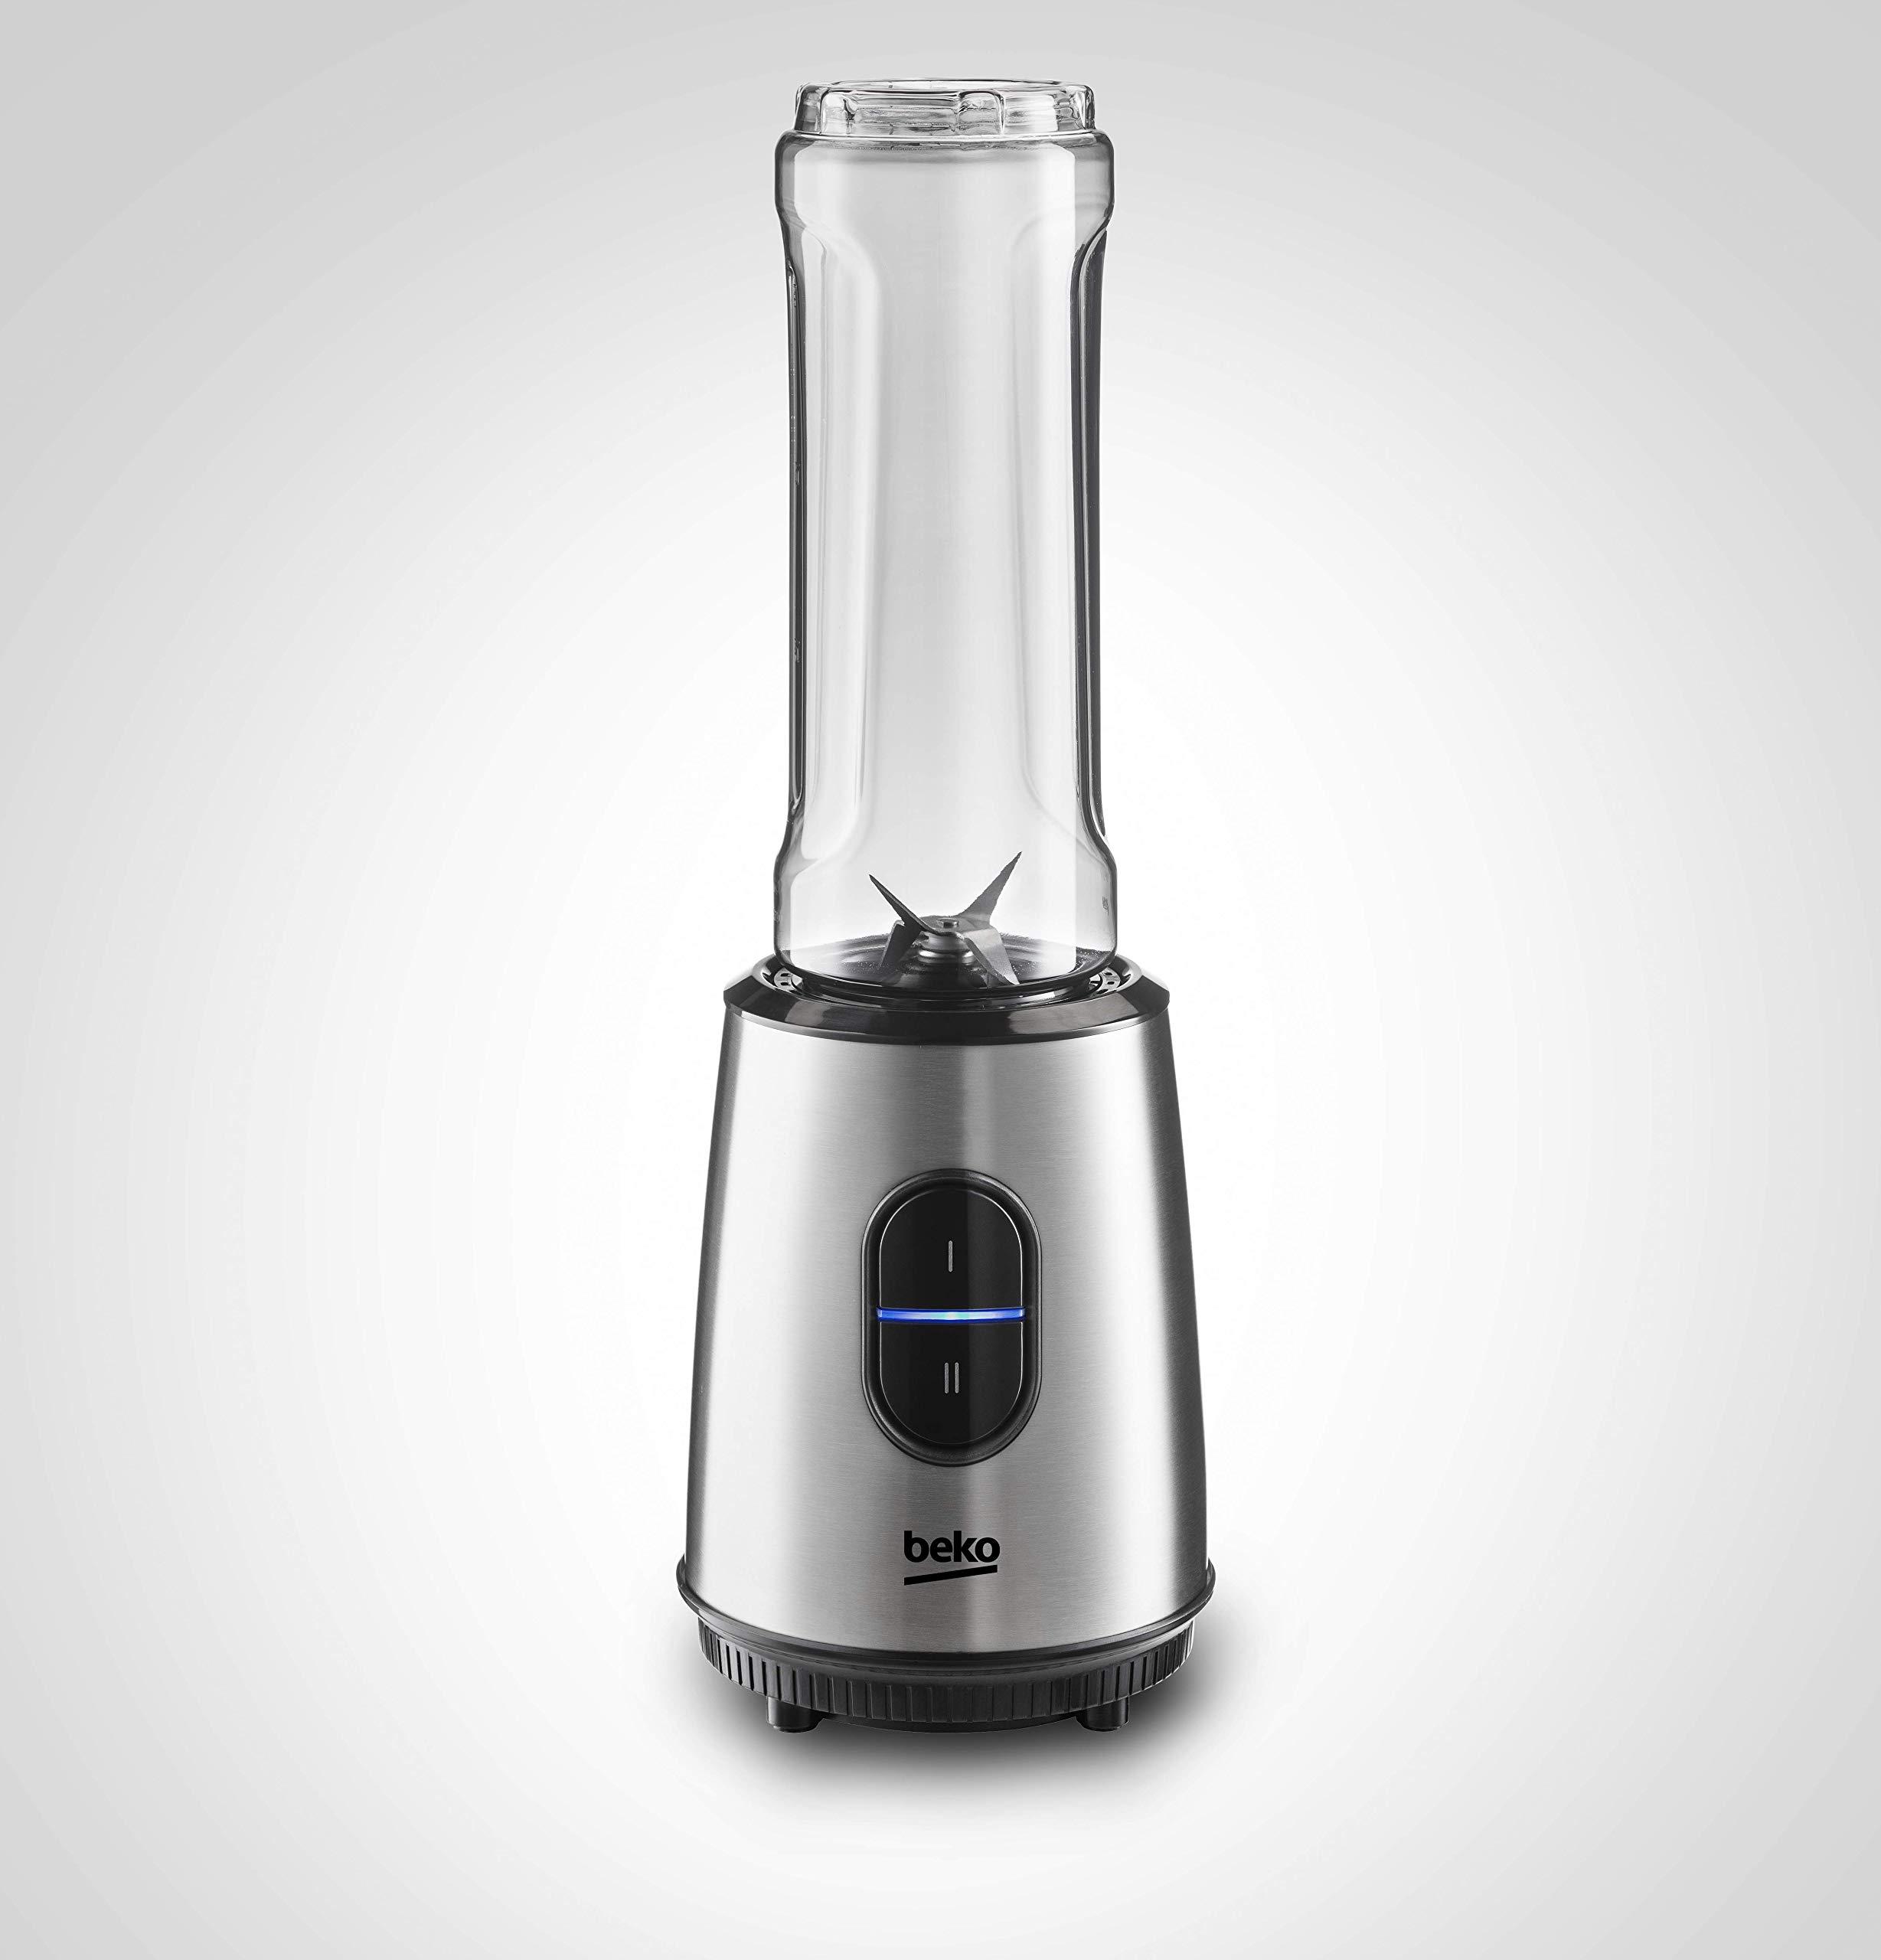 Beko TBP7354X - Licuadora (0,6 L, Batidora de vaso, Negro, Acero ...